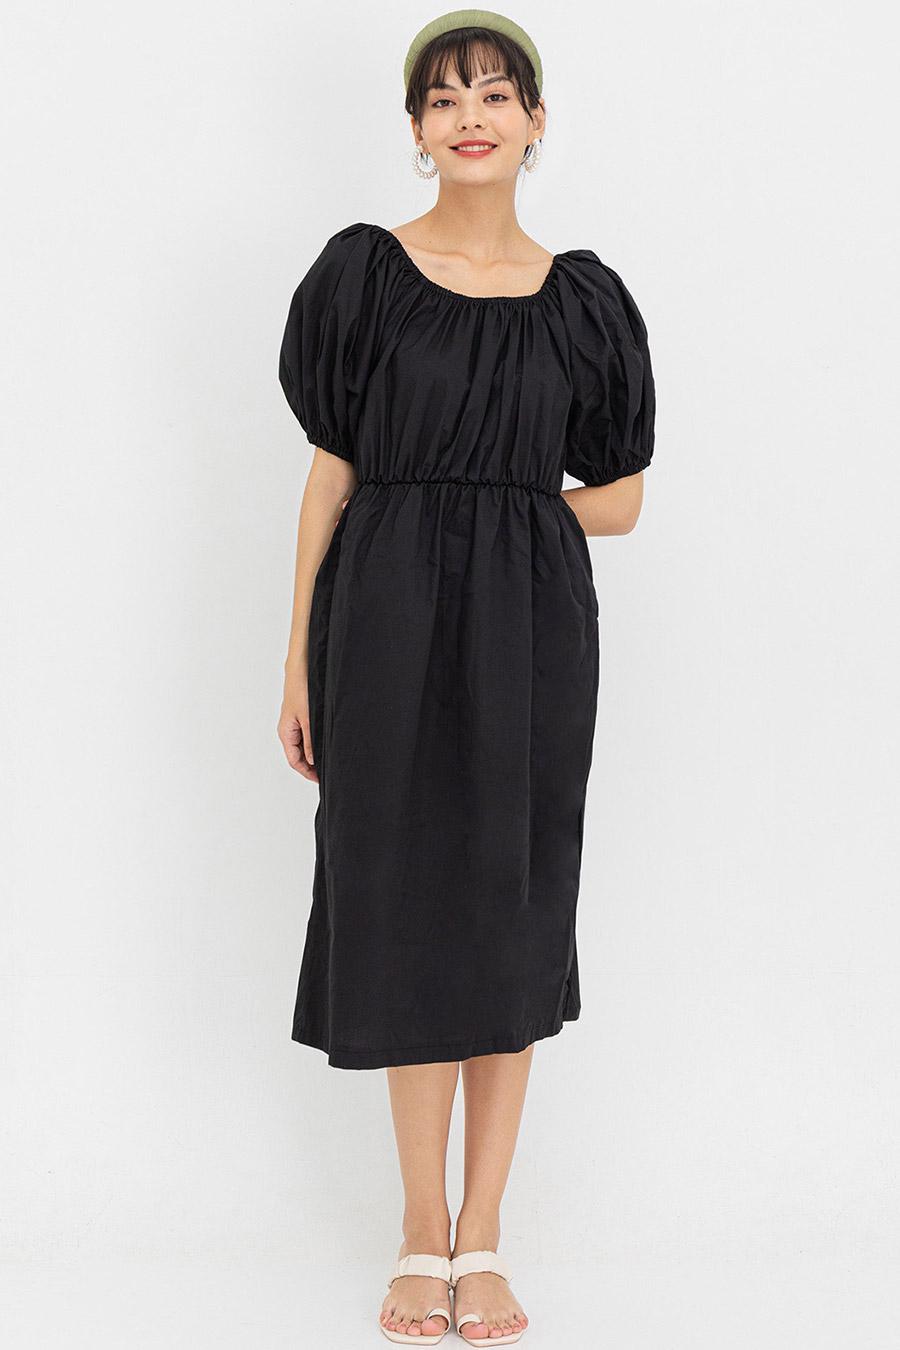 RENEE DRESS - NOIR